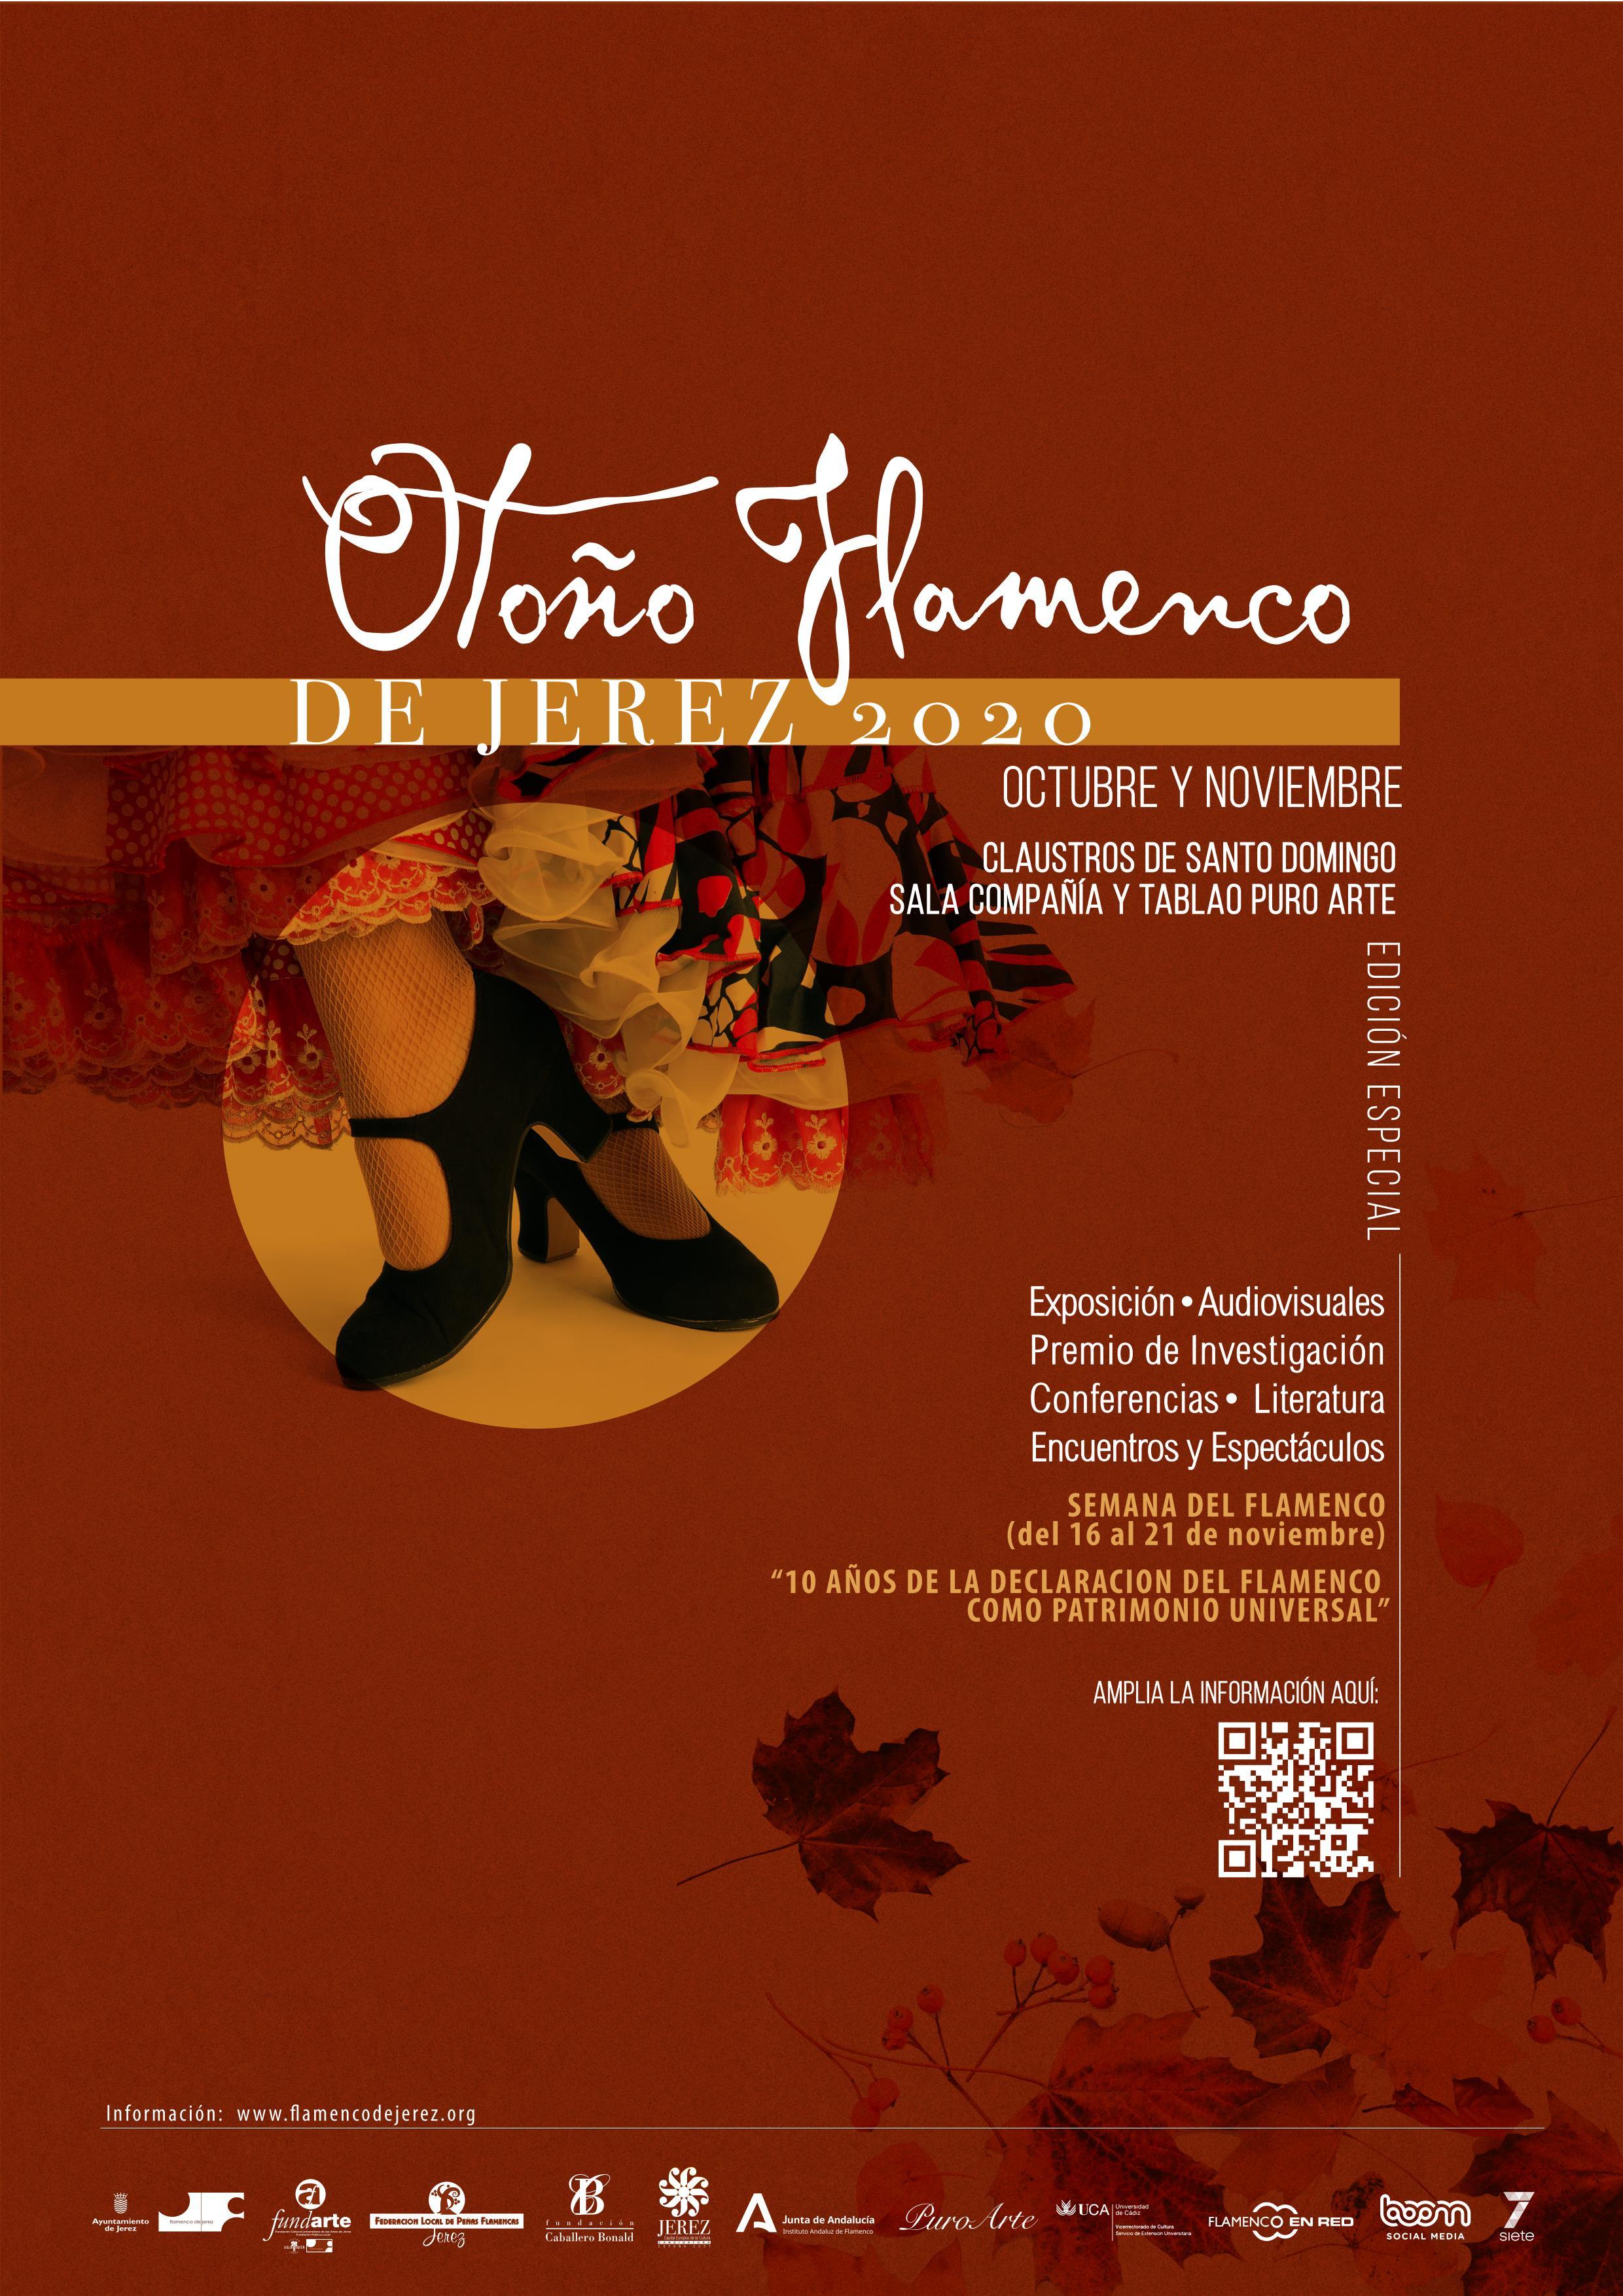 Otoño Flamenco